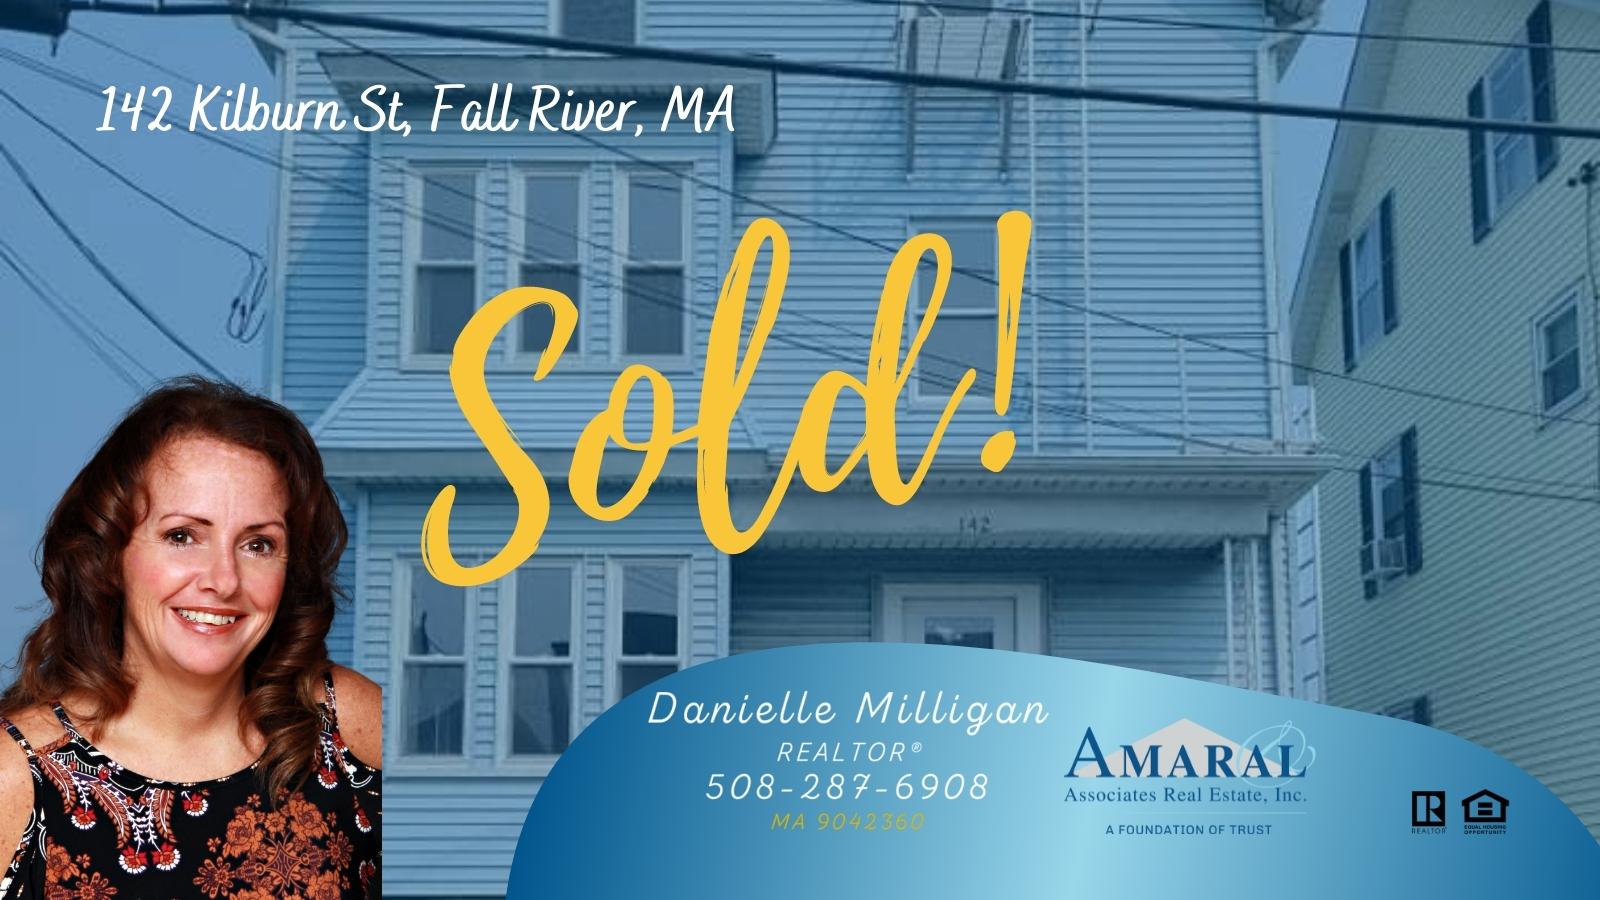 SOLD with Danielle Milligan! 142 Kilburn St, Fall River, MA